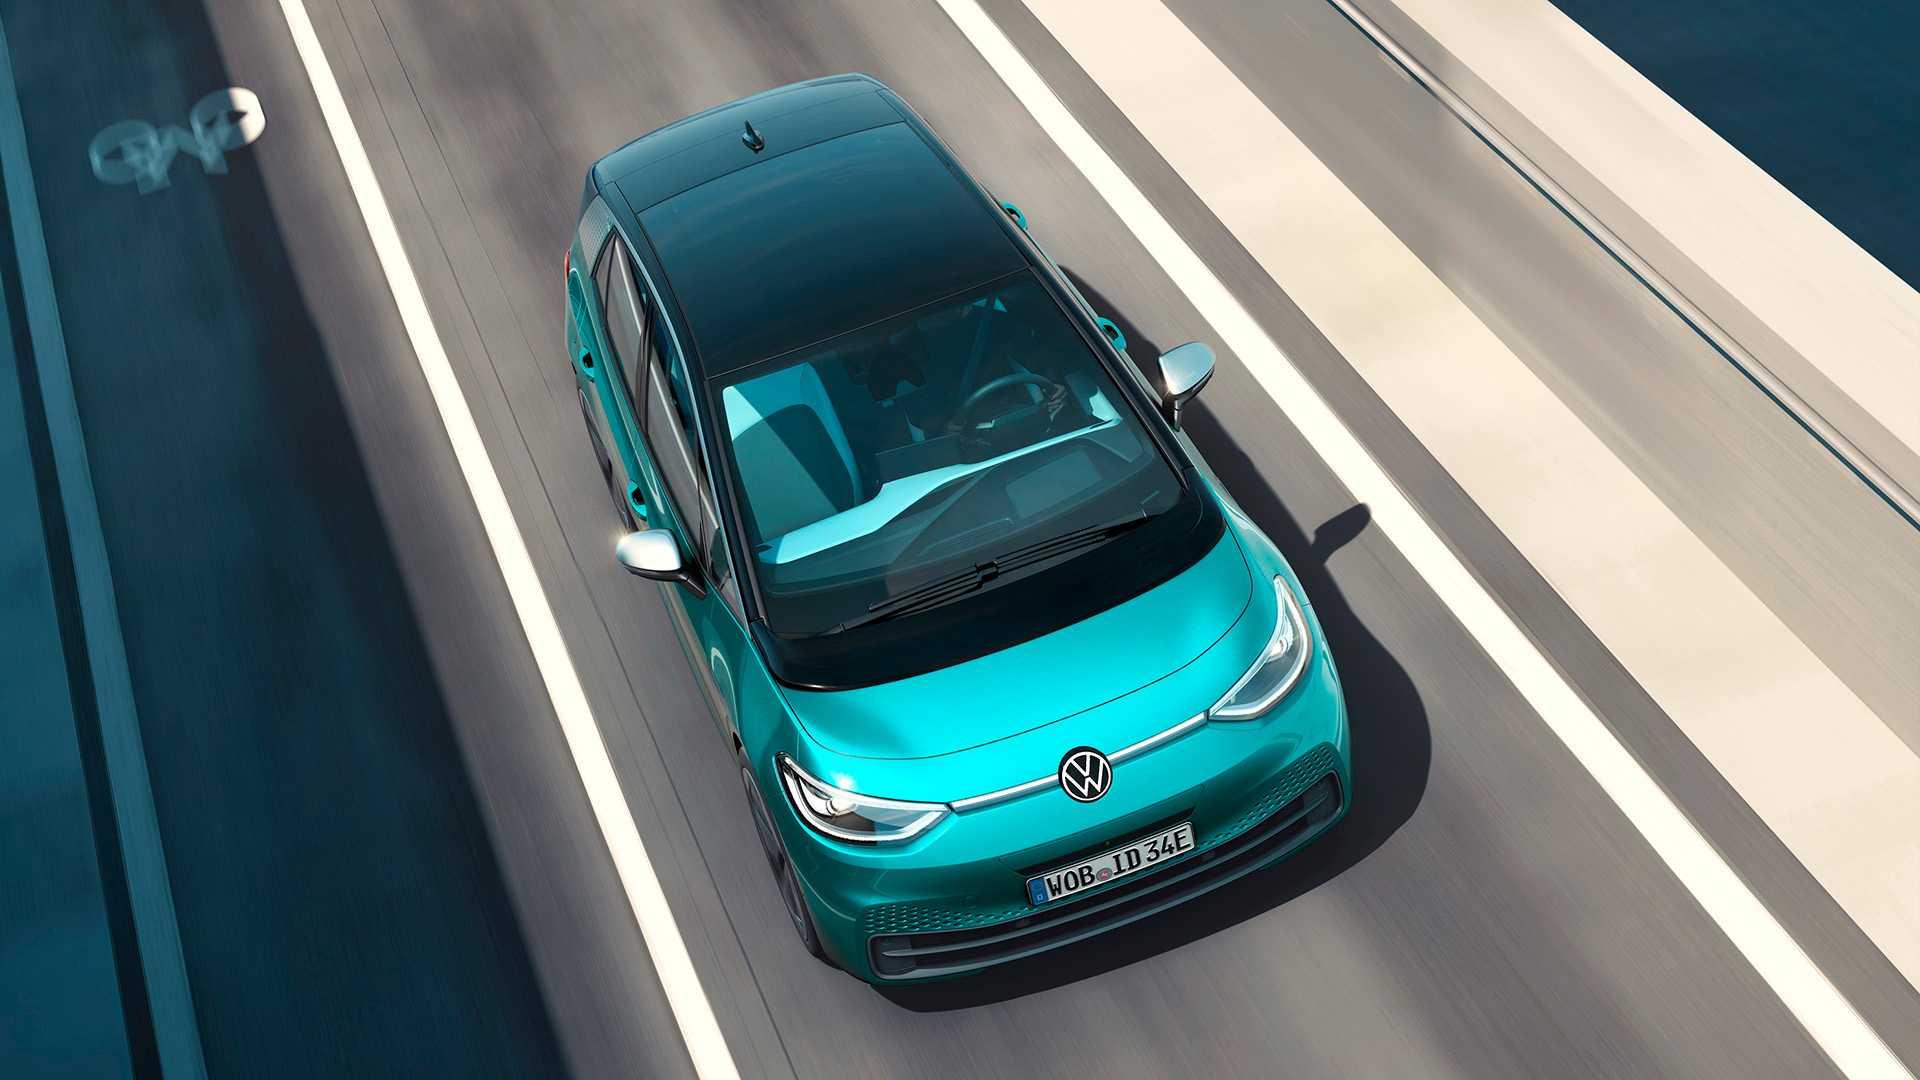 Volkswagen ID.3 1ST MAX (1ST EDITION)